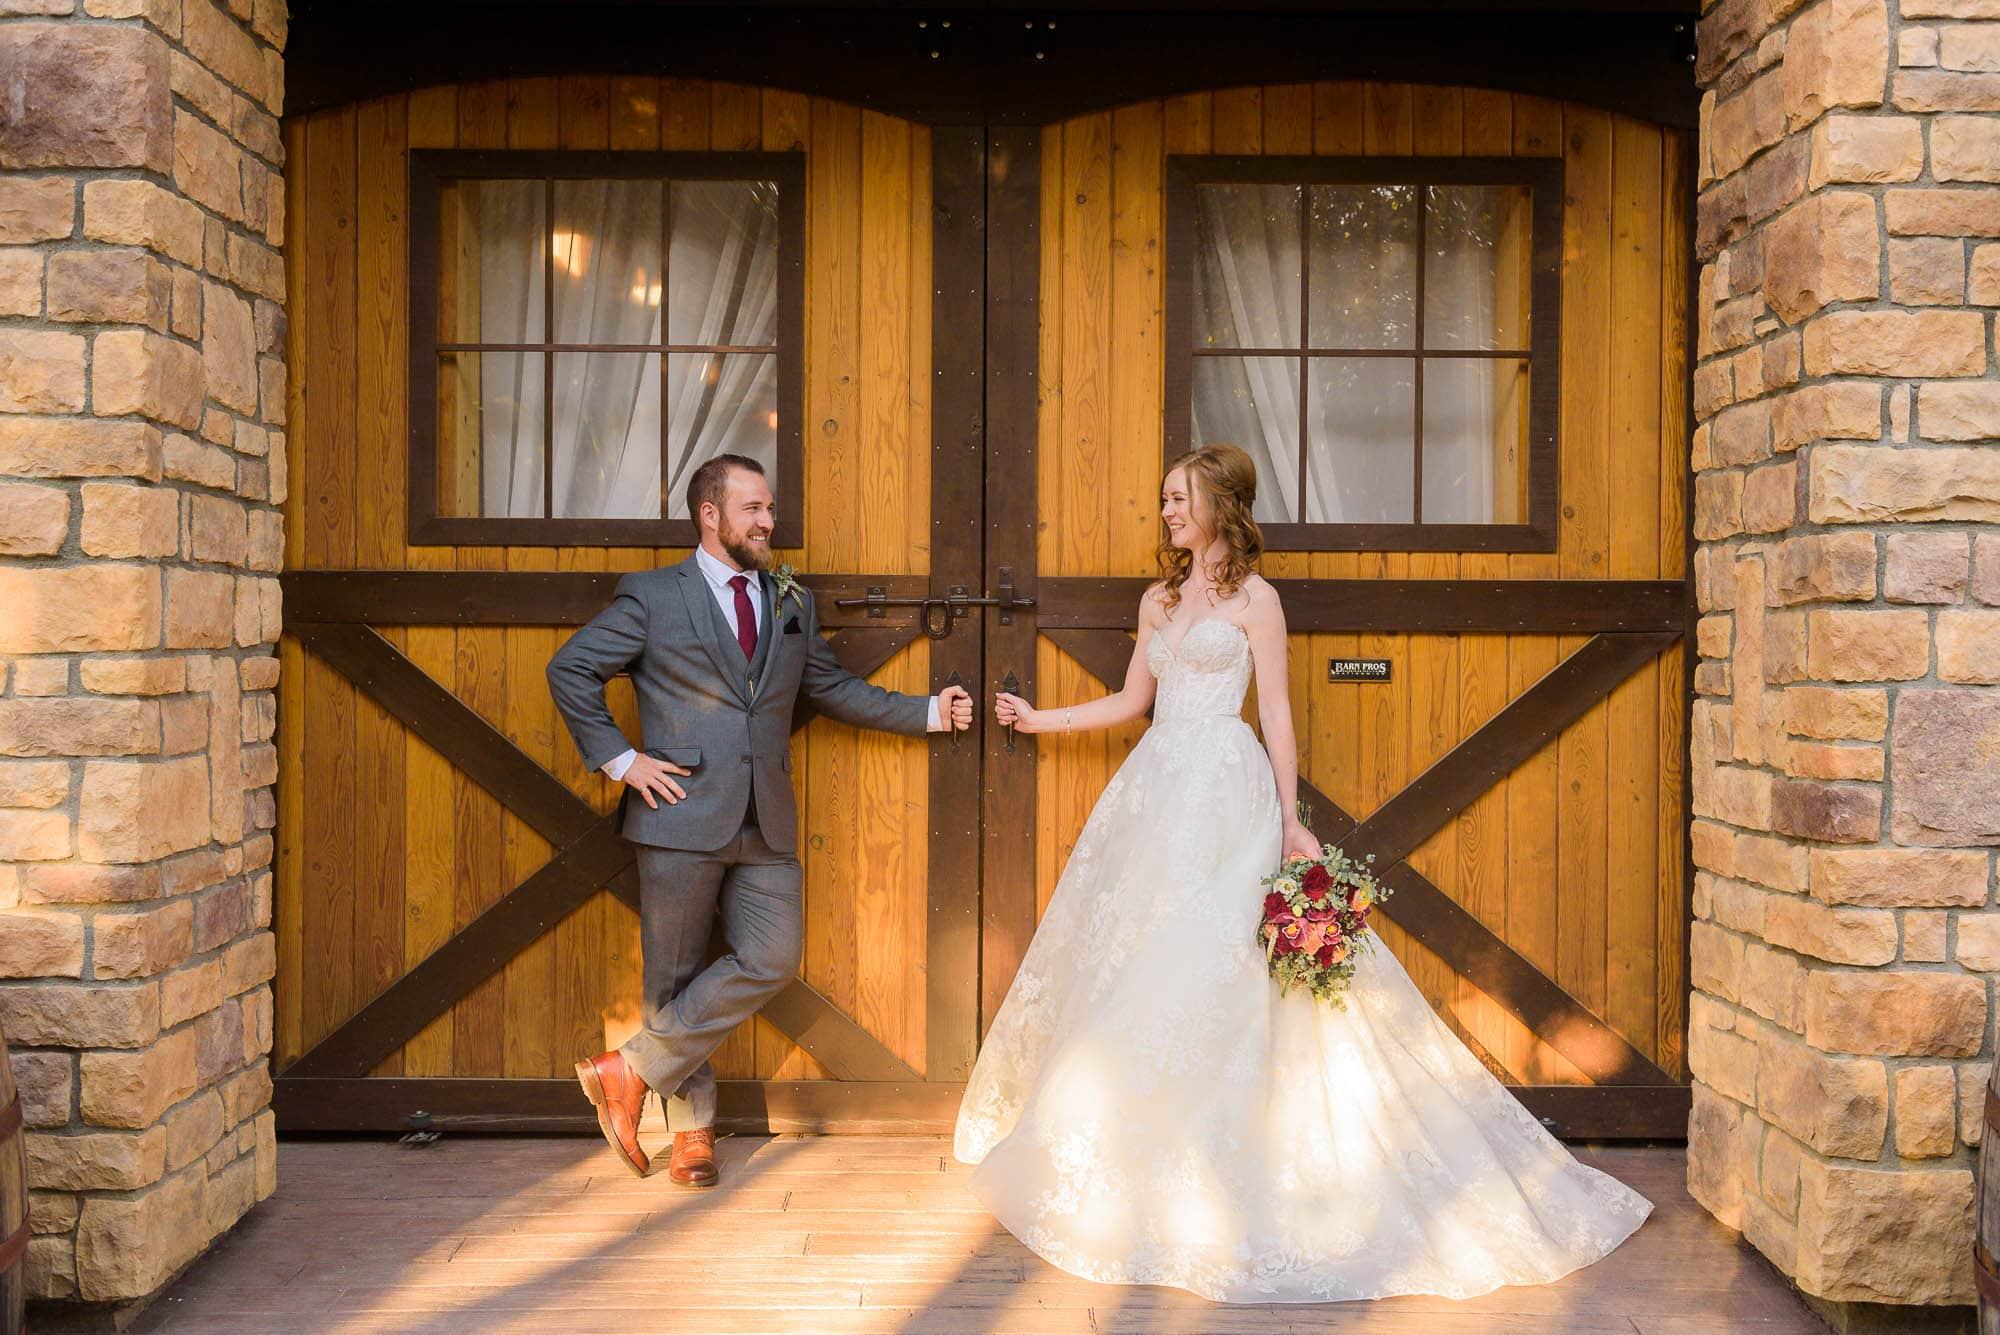 393_Alan_and_Heidi_Serendipity_Garden_Wedding_10-27-2018